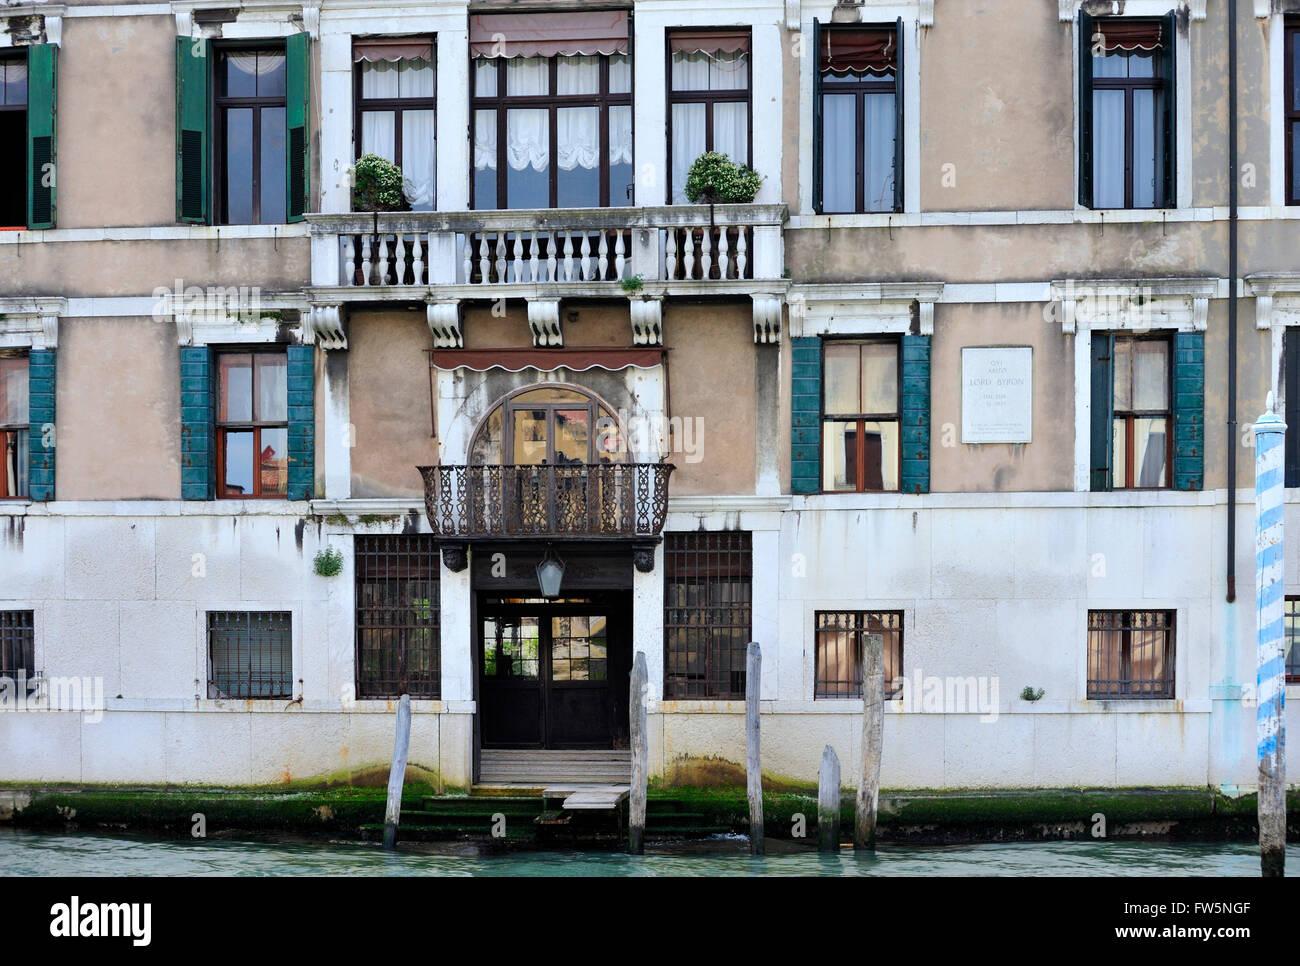 Byrons Palace, Canal Grande, Venedig: Palazzo Mocenigo Casa Vecchia, gebaut von Alvise Mocenigo ca. 1579, wo englischer Stockbild